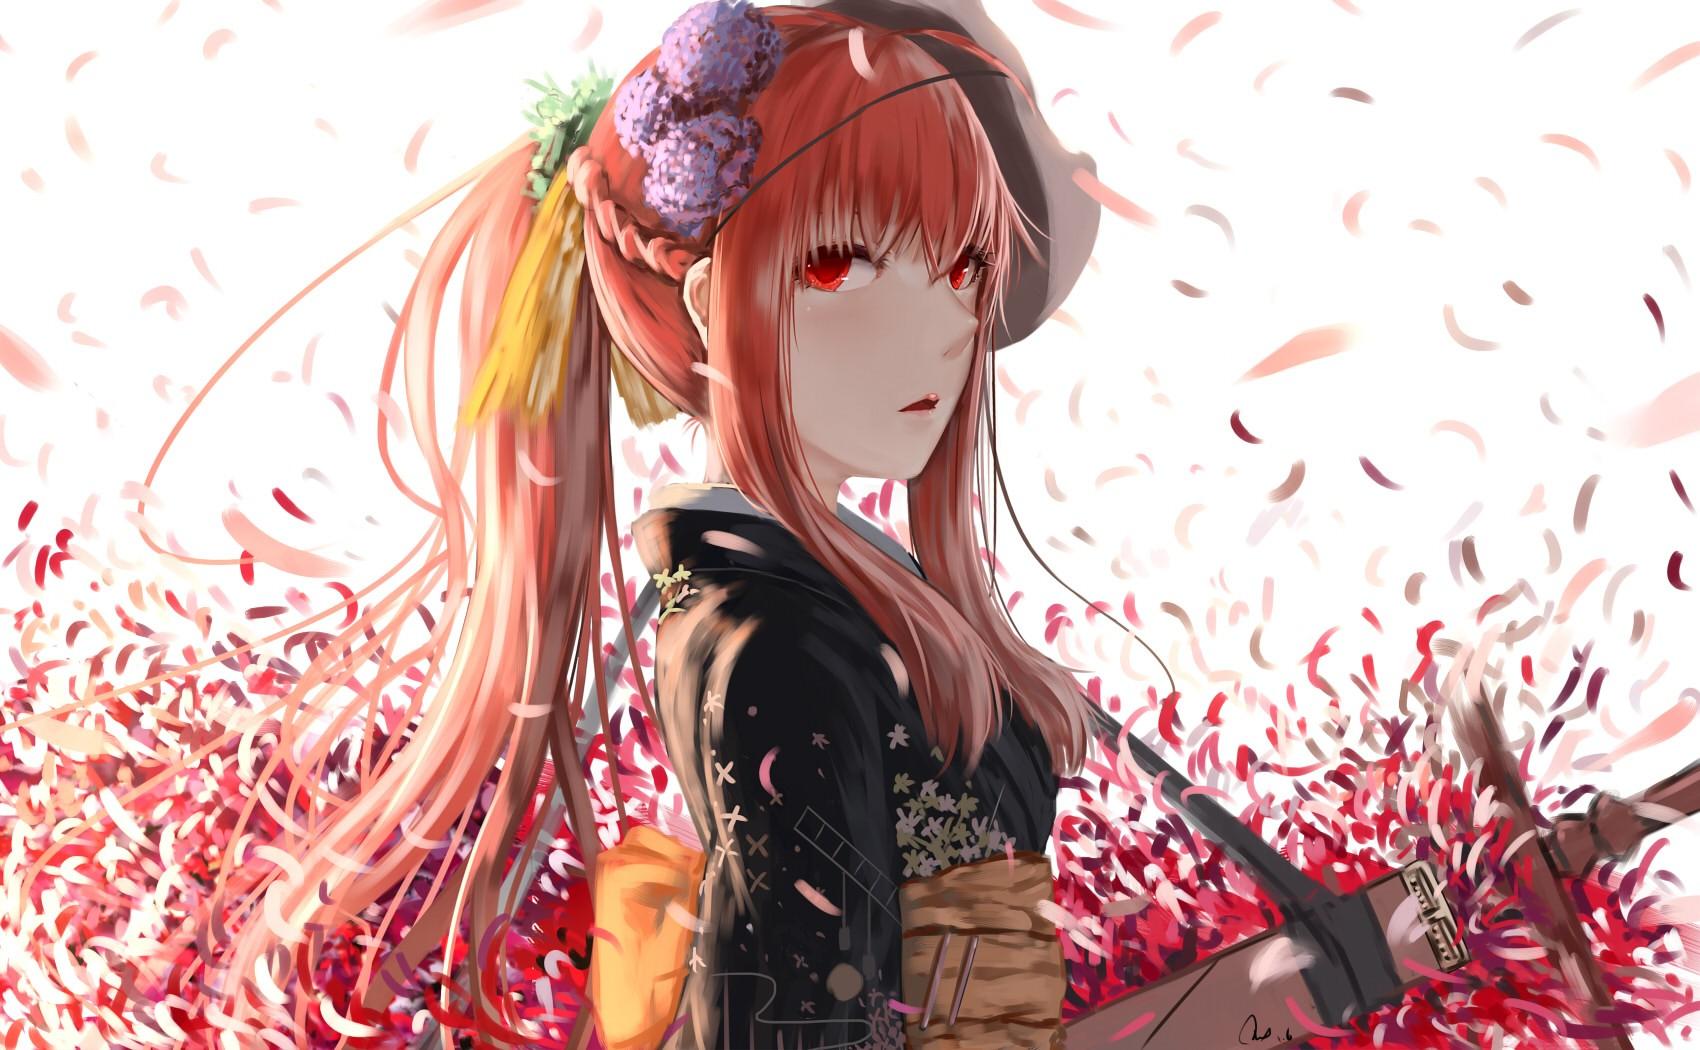 Wallpaper : anime girls, weapon, mask, sword, petals ...